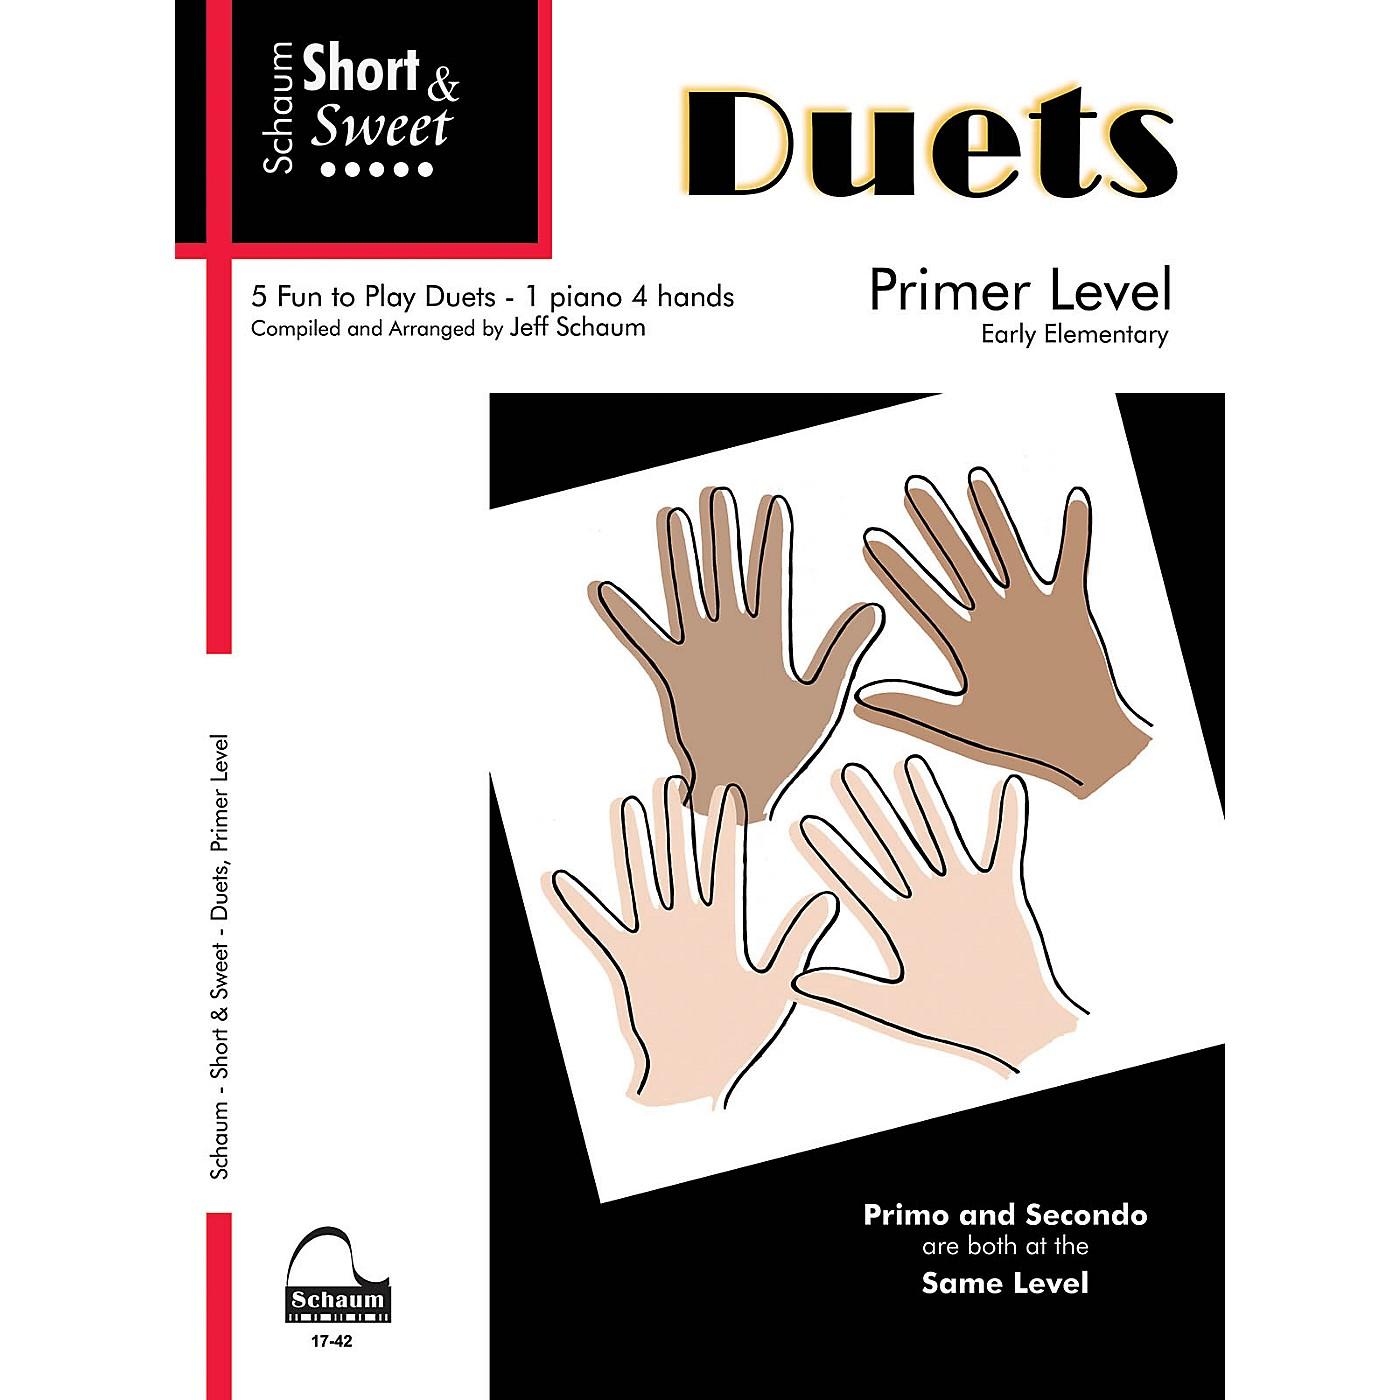 SCHAUM Short & Sweet: Duets Educational Piano Book (Level Early Elem) thumbnail